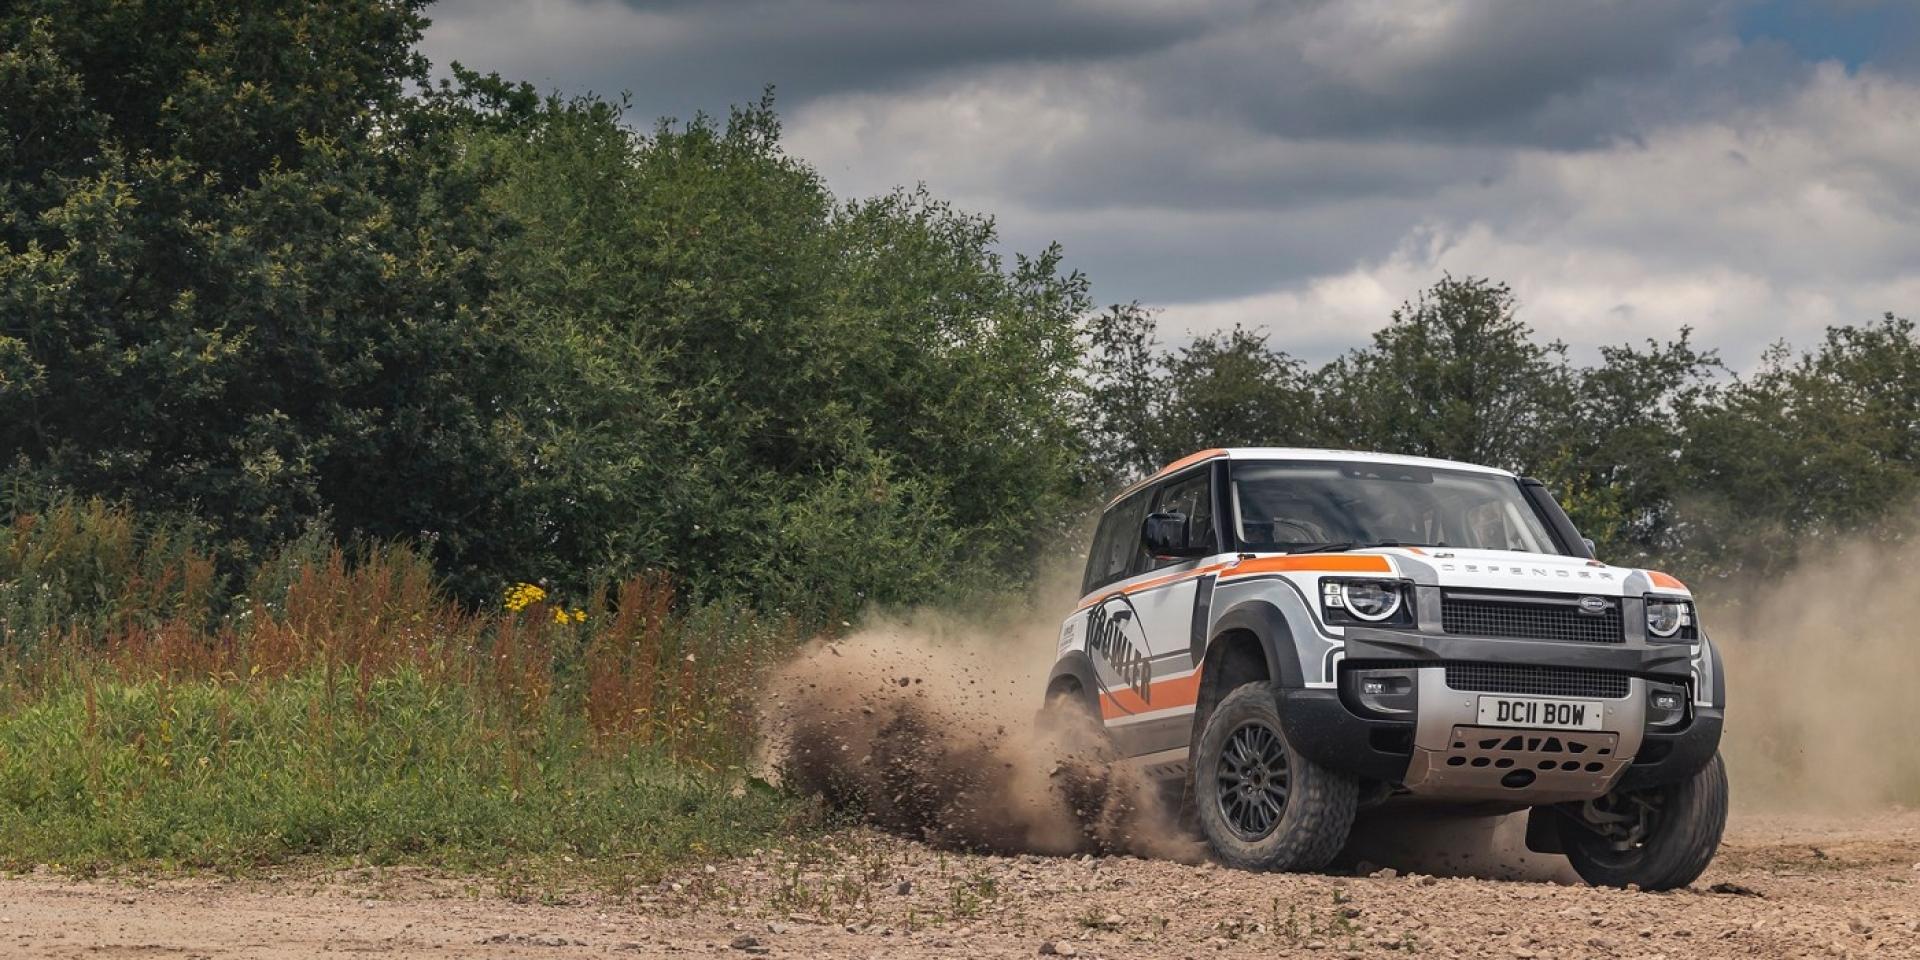 Land Rover Defender跨足賽車,明年舉辦統規系列賽